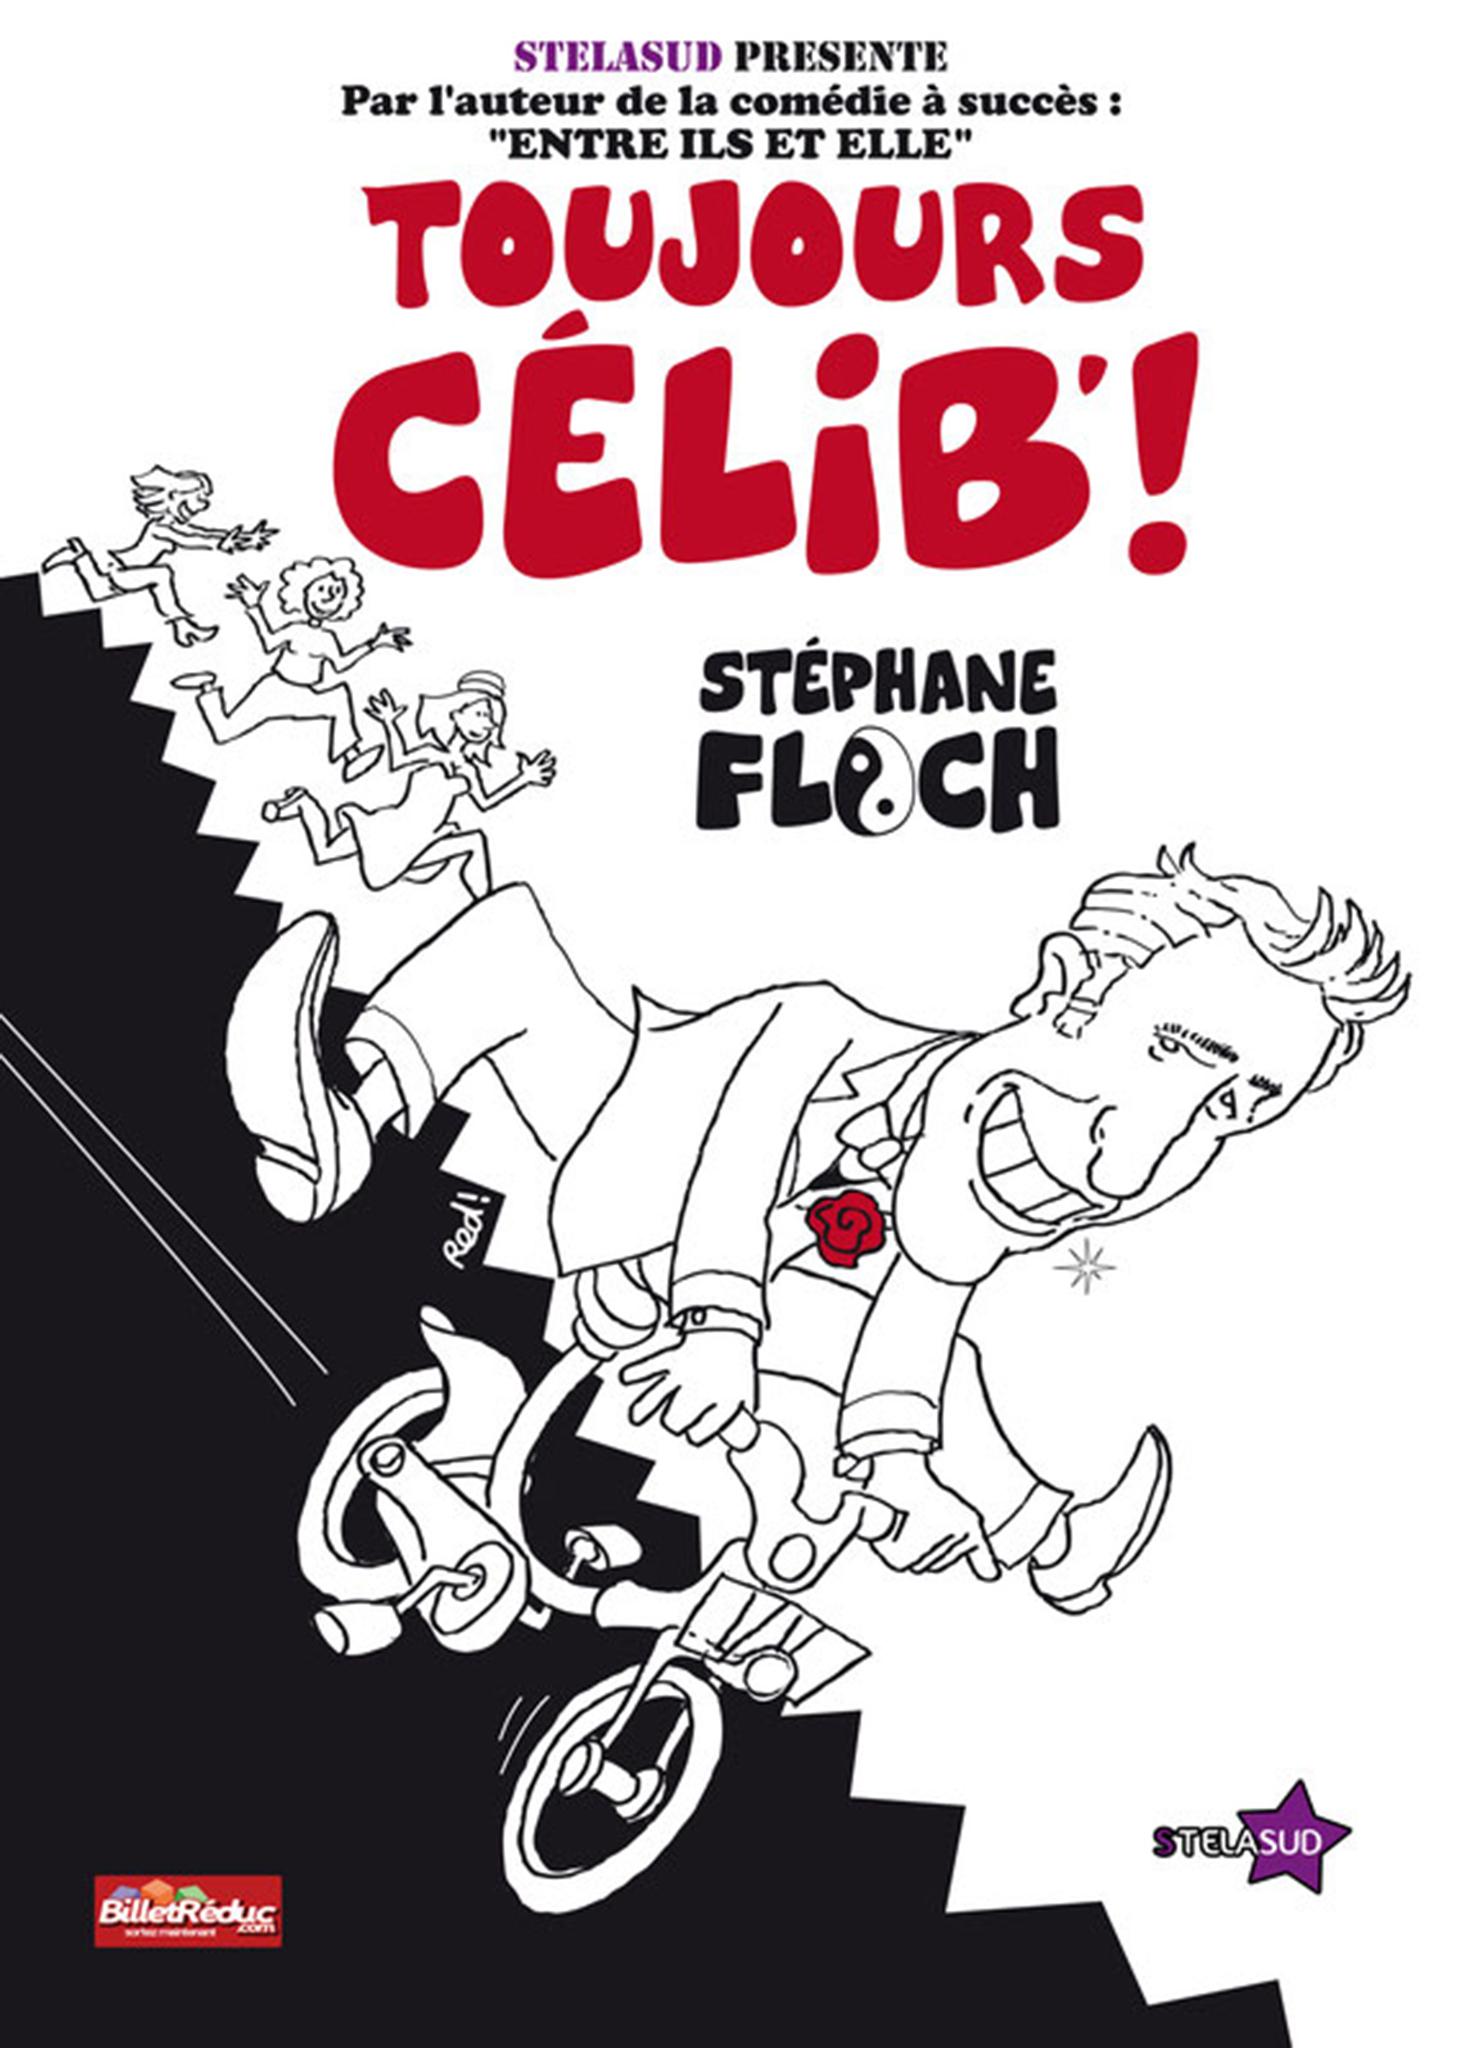 Stephane Floch Toujours célib!_140218G